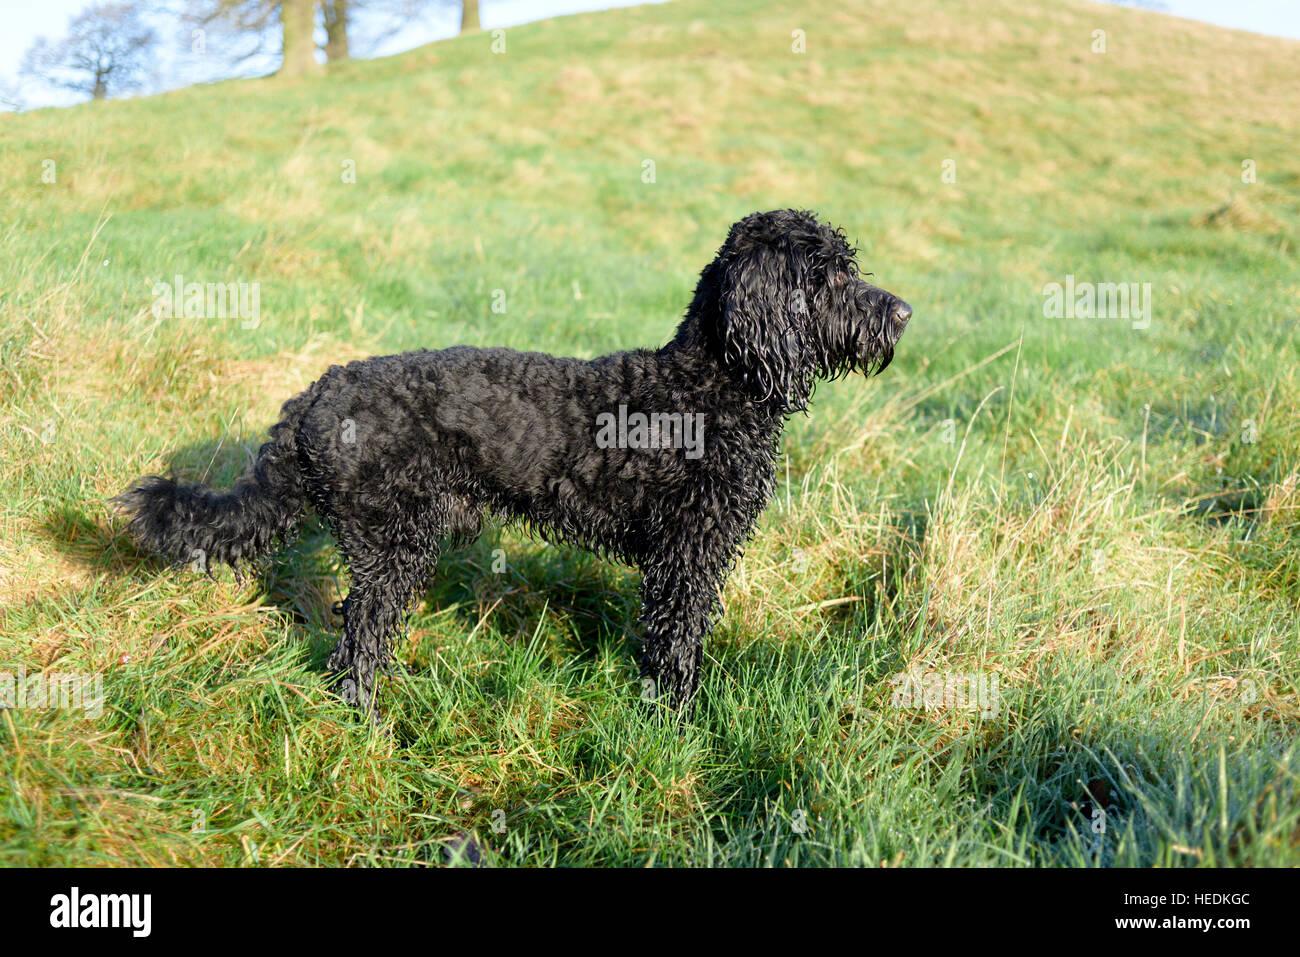 Cockapoo ,Male black dog. - Stock Image